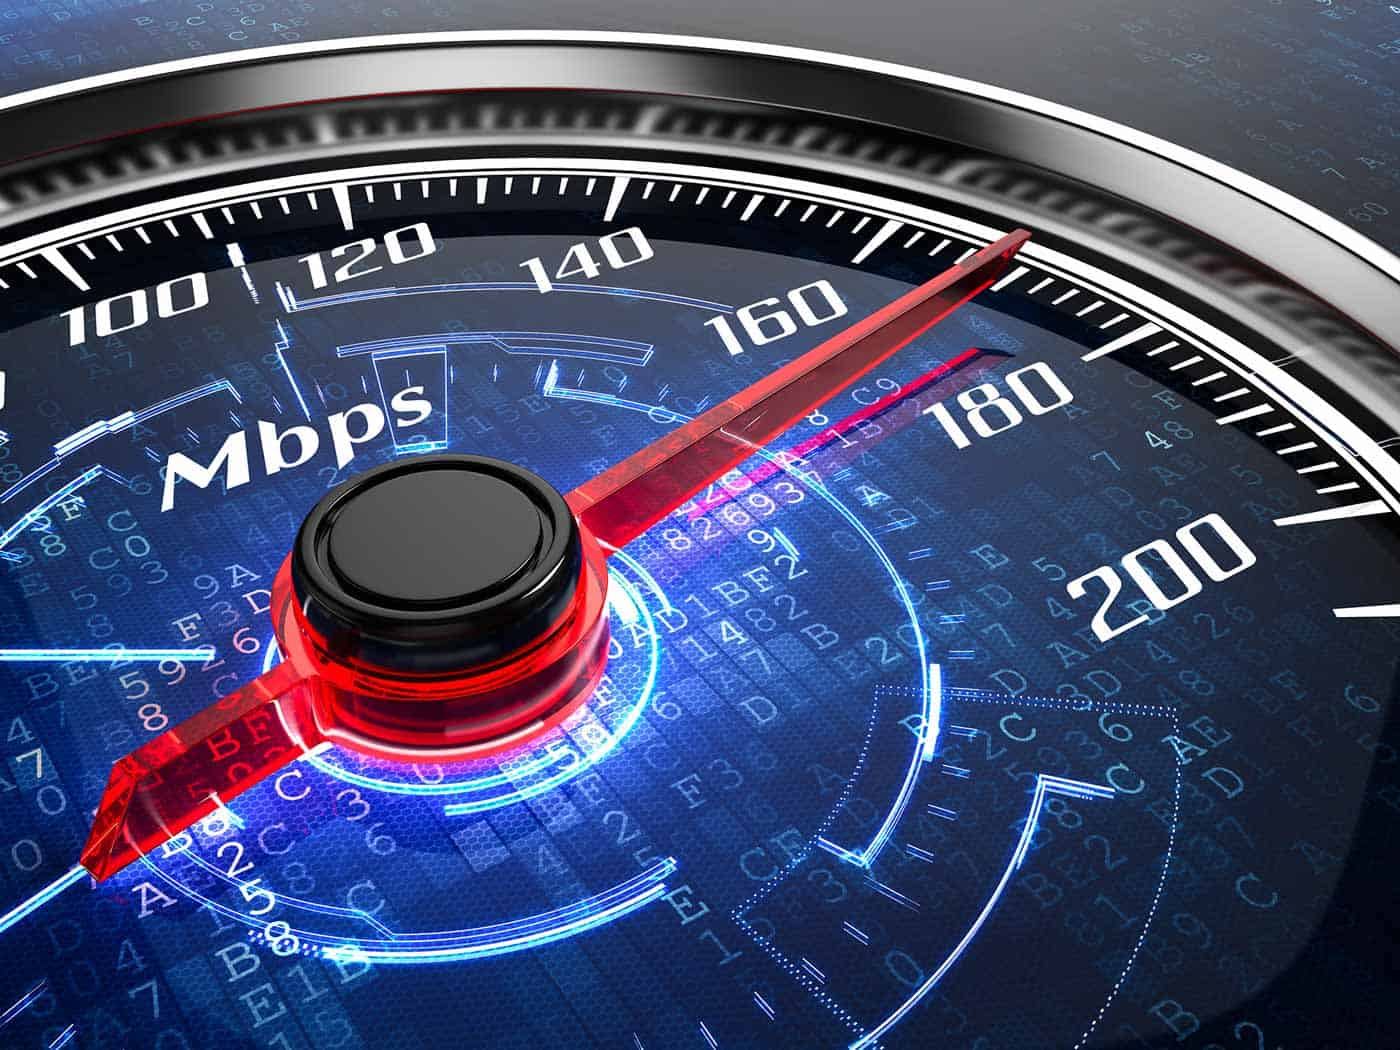 supersonic-speedy-website-in-nottingham